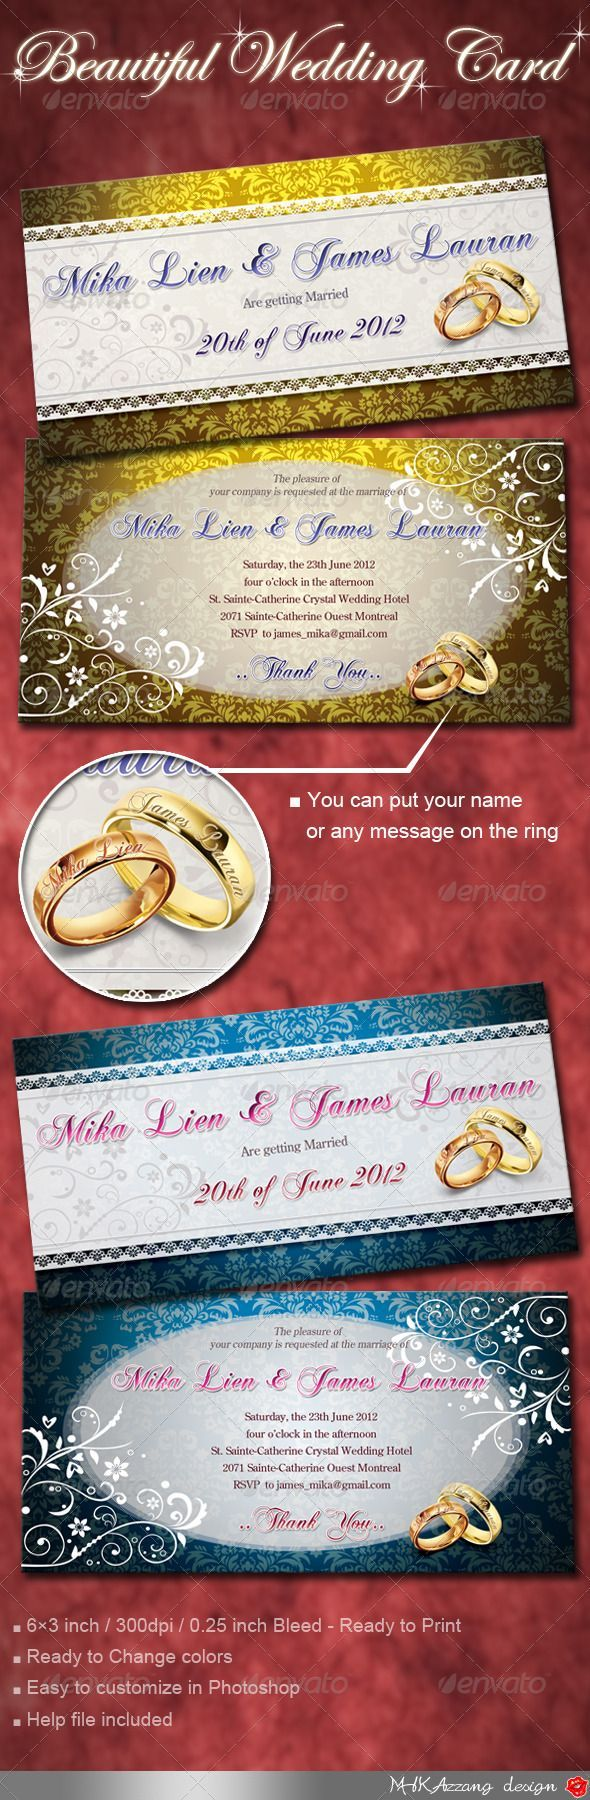 65+ Best Wedding Invitation Templates - PSD & InDesign | Invitation ...